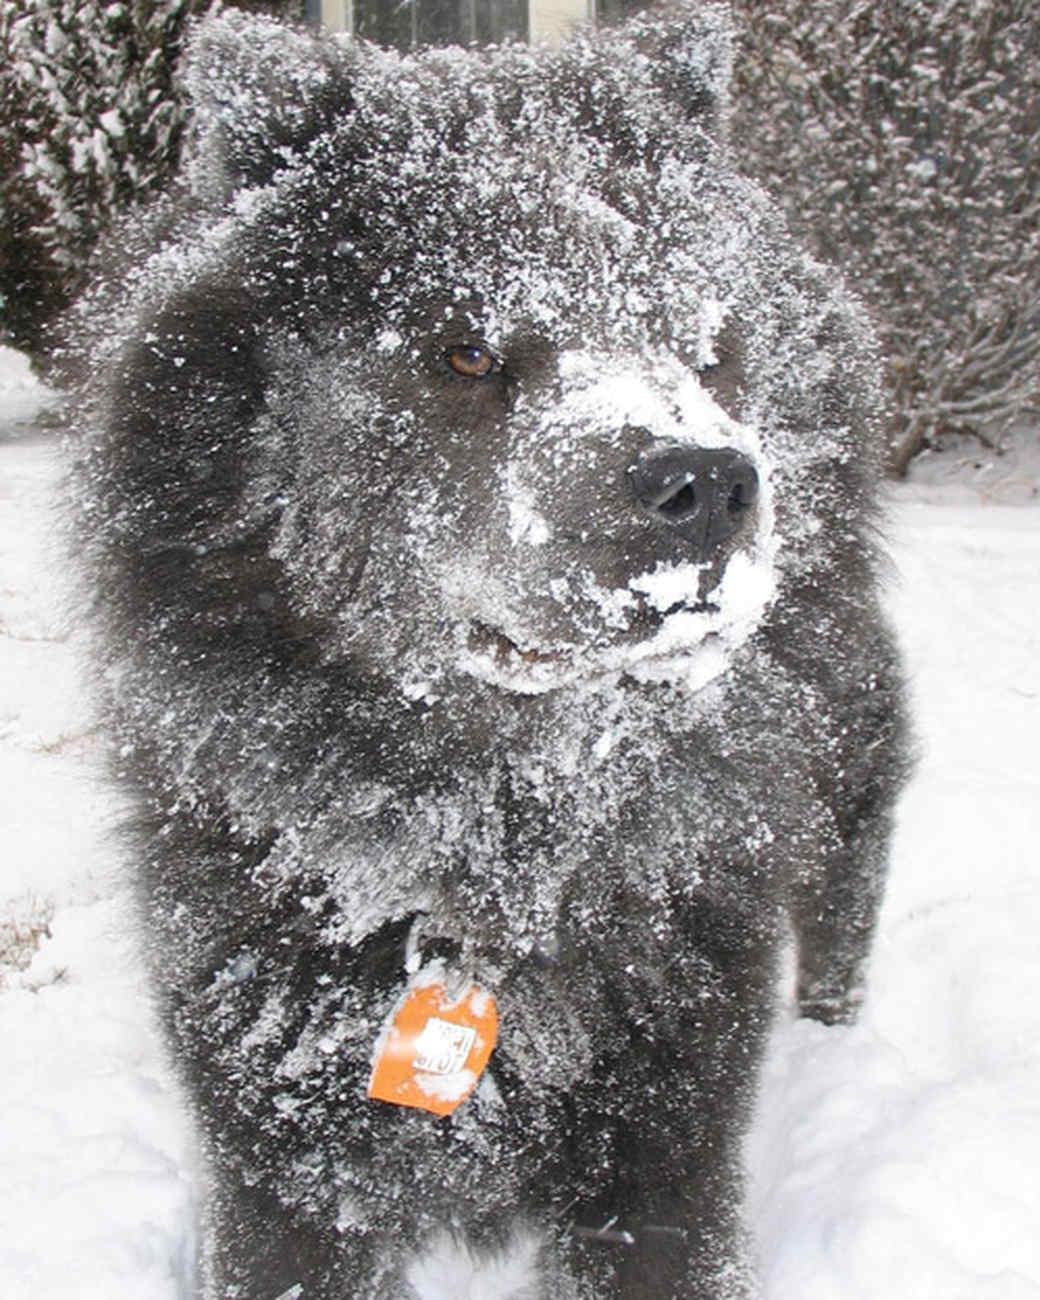 pets_snowangels_7247613_122717_11404171.jpg